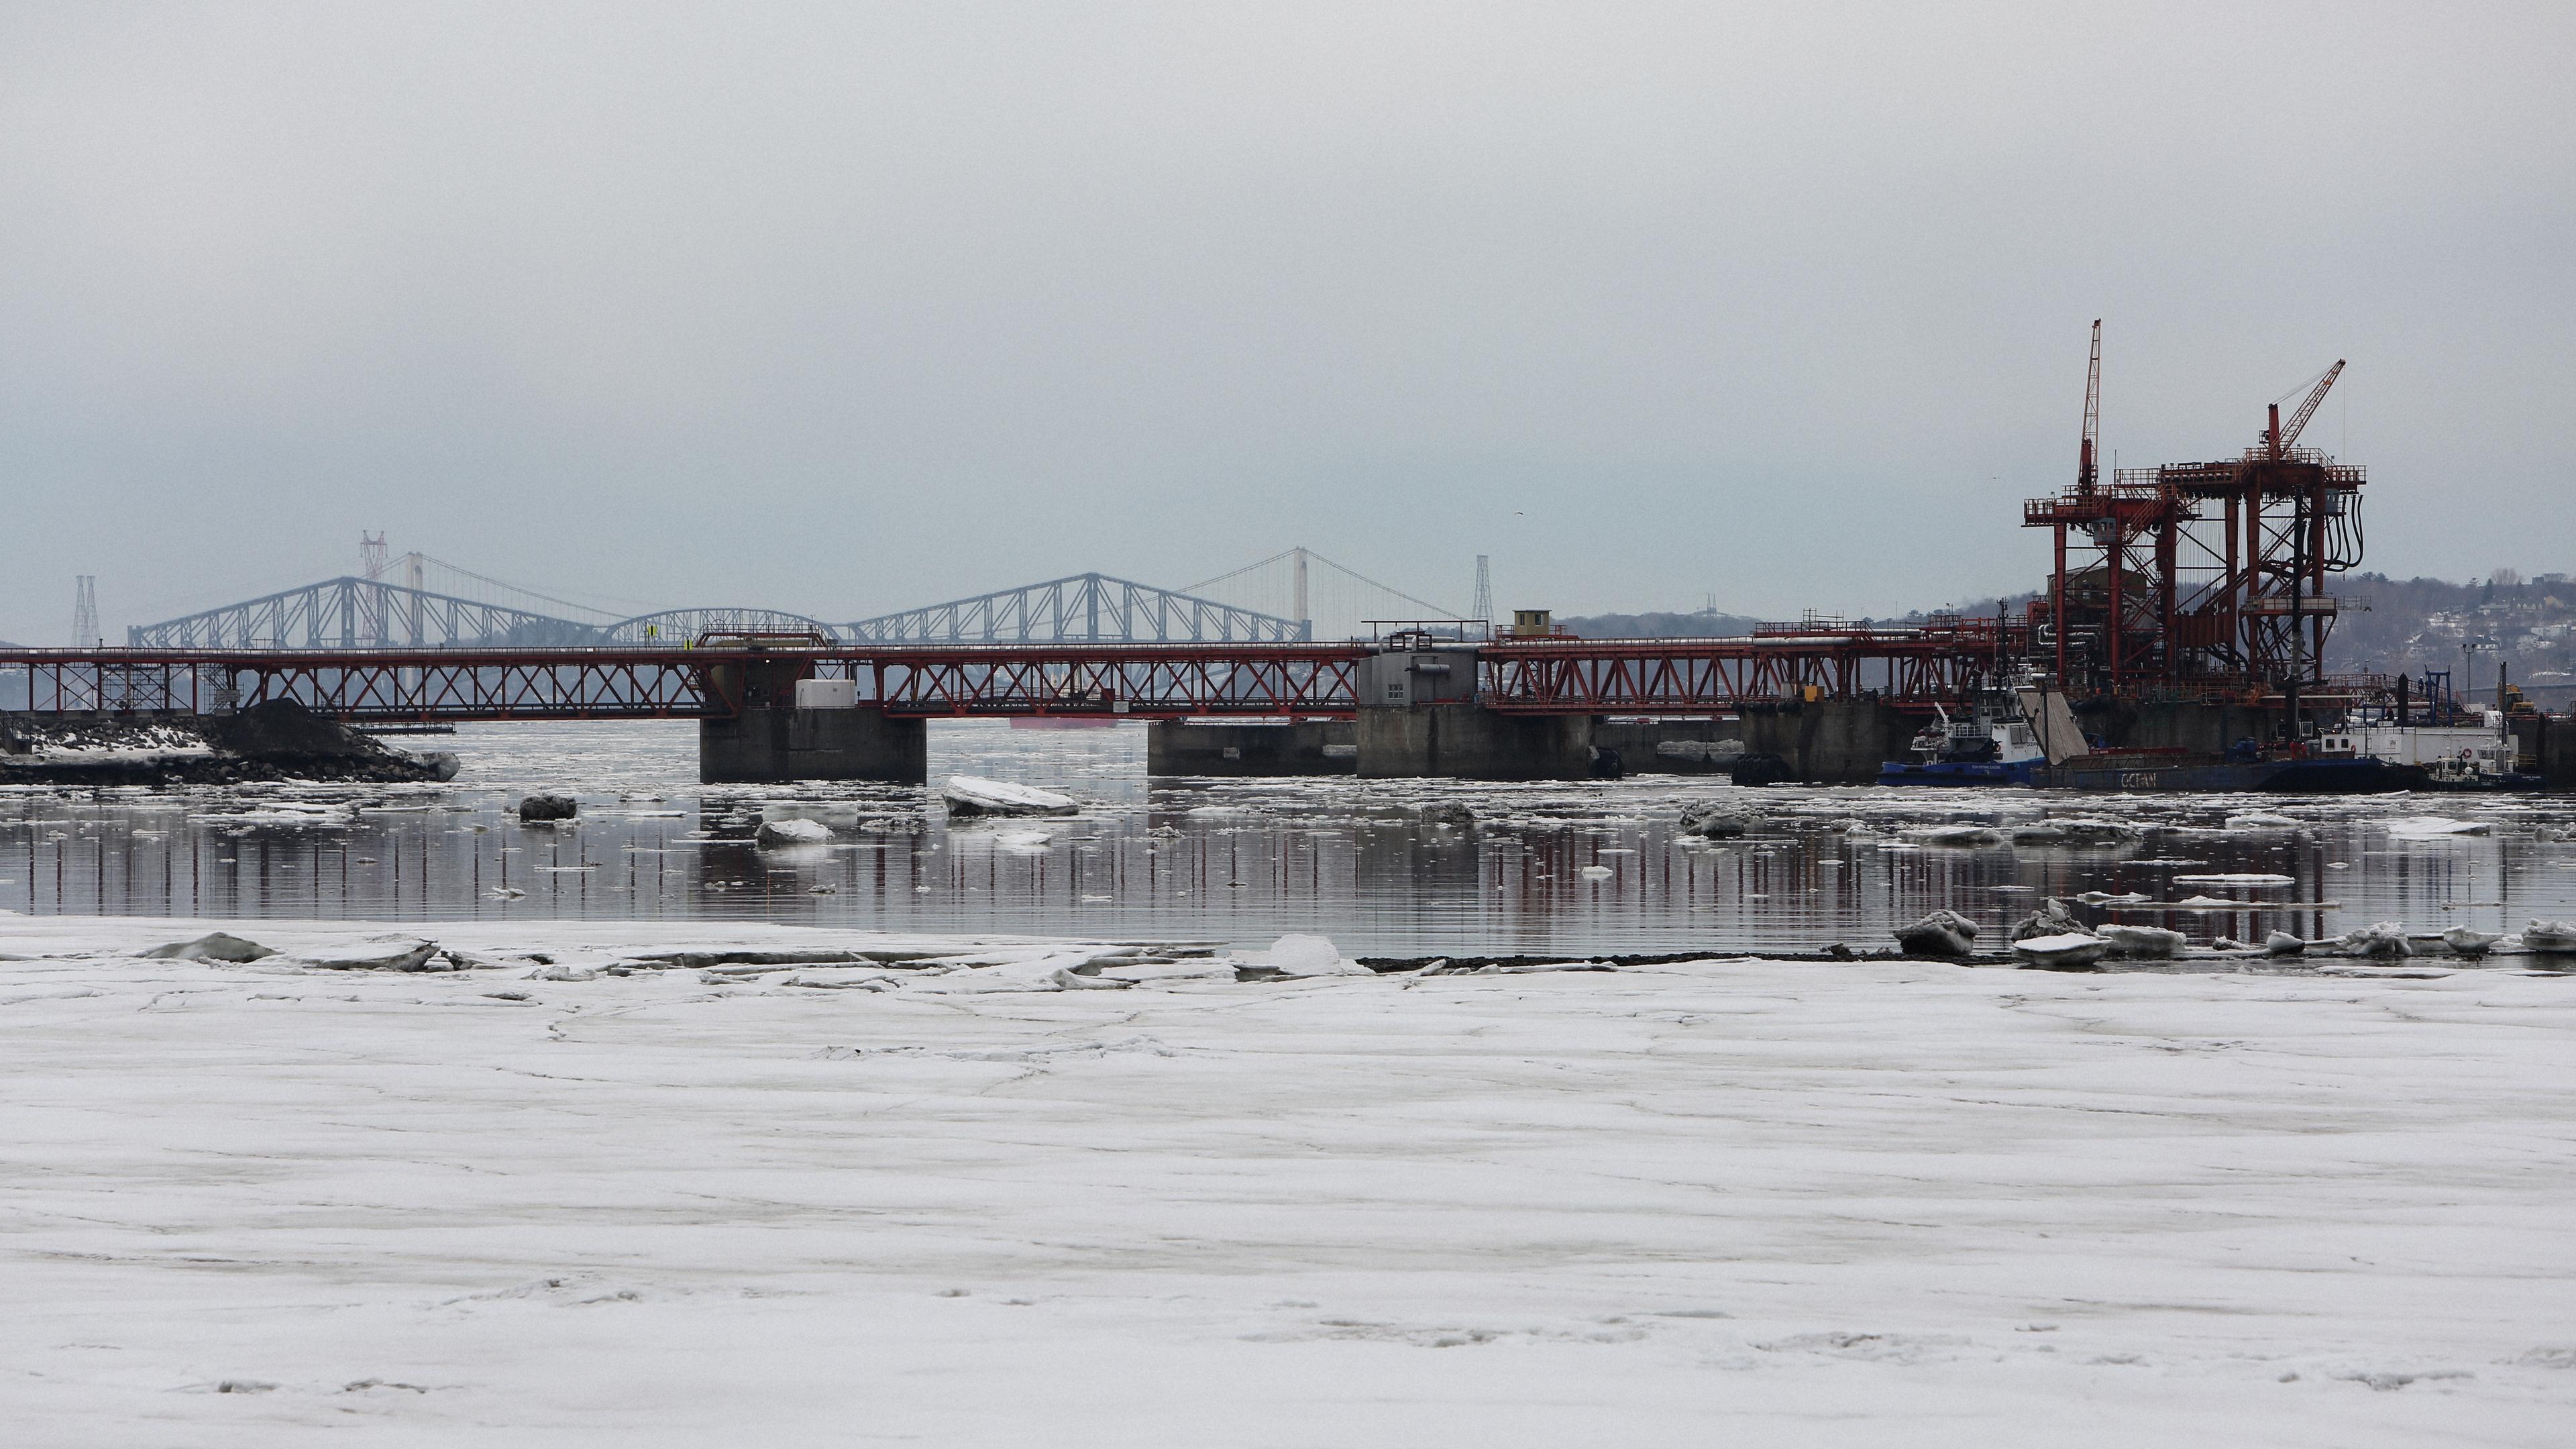 bridge river buildings snow 4k 1541113999 - bridge, river, buildings, snow 4k - River, buildings, bridge